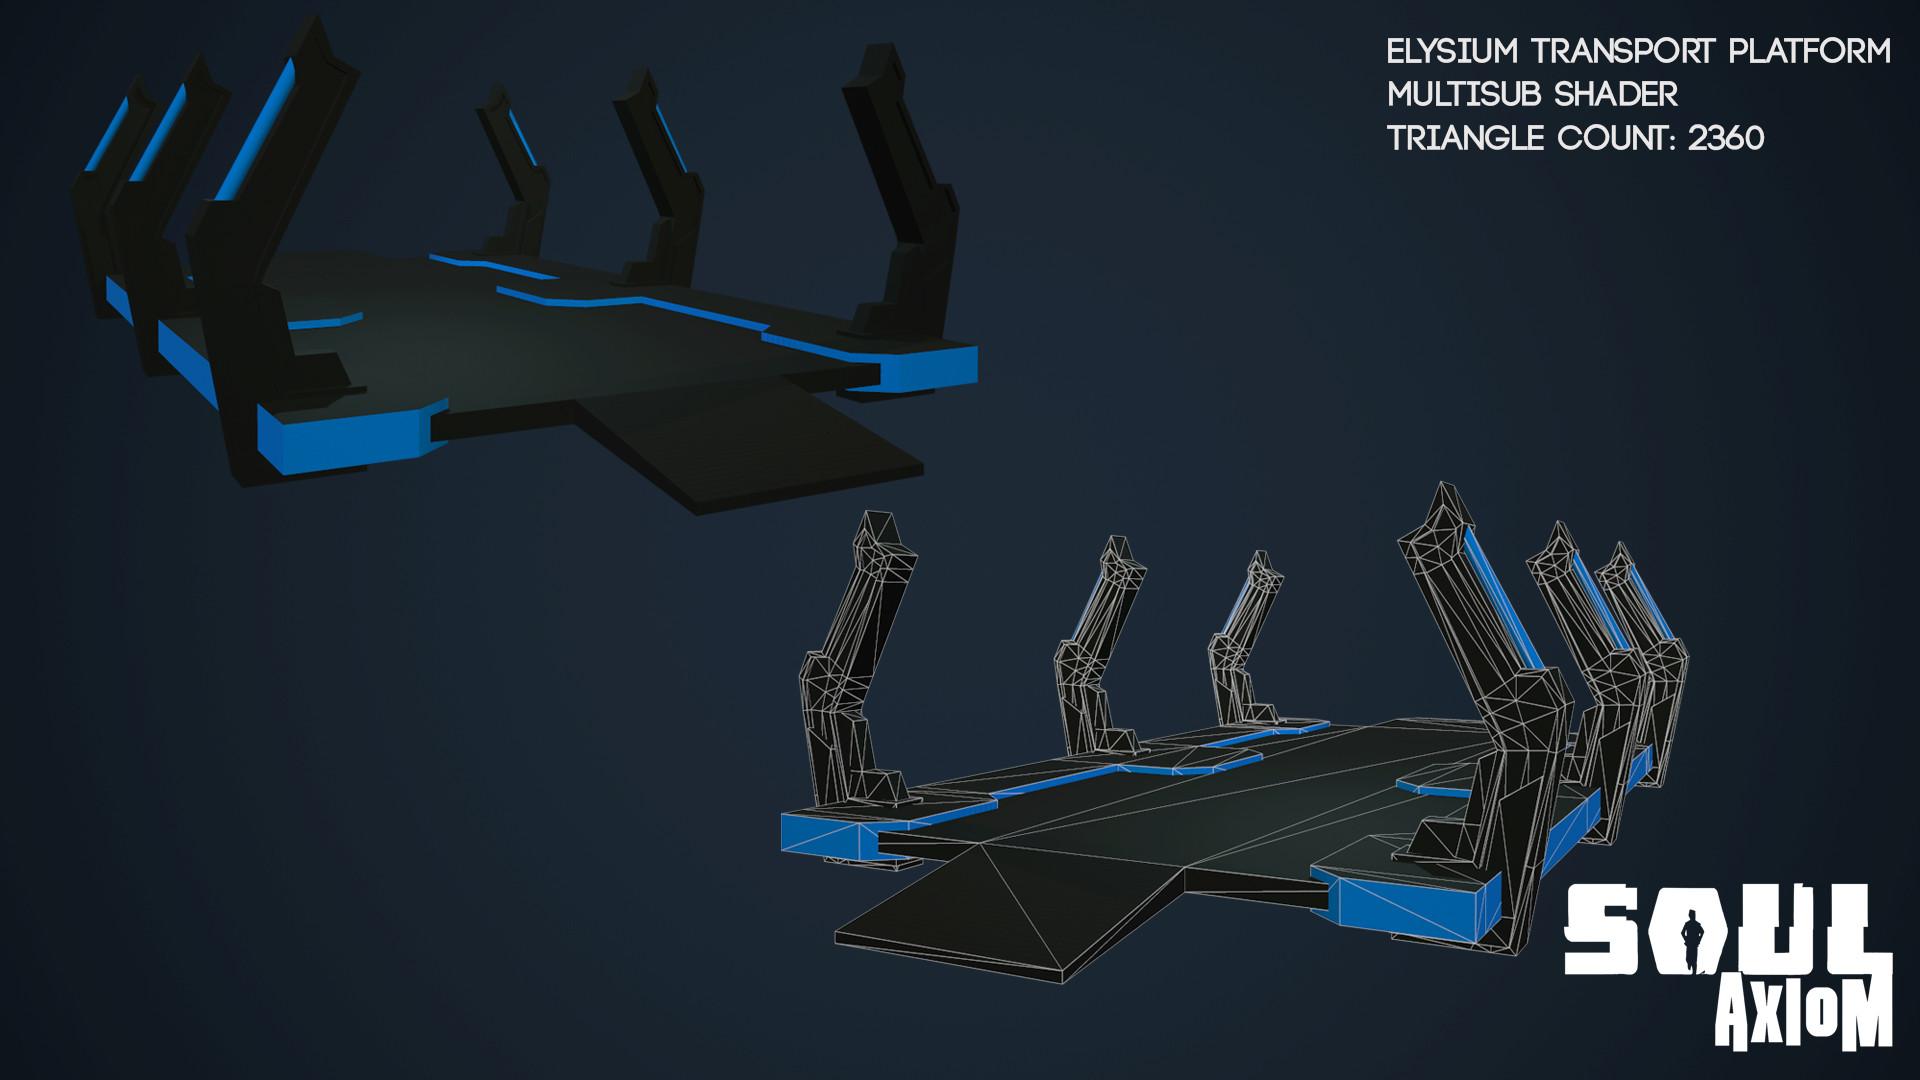 Martin giles elysium transport platform